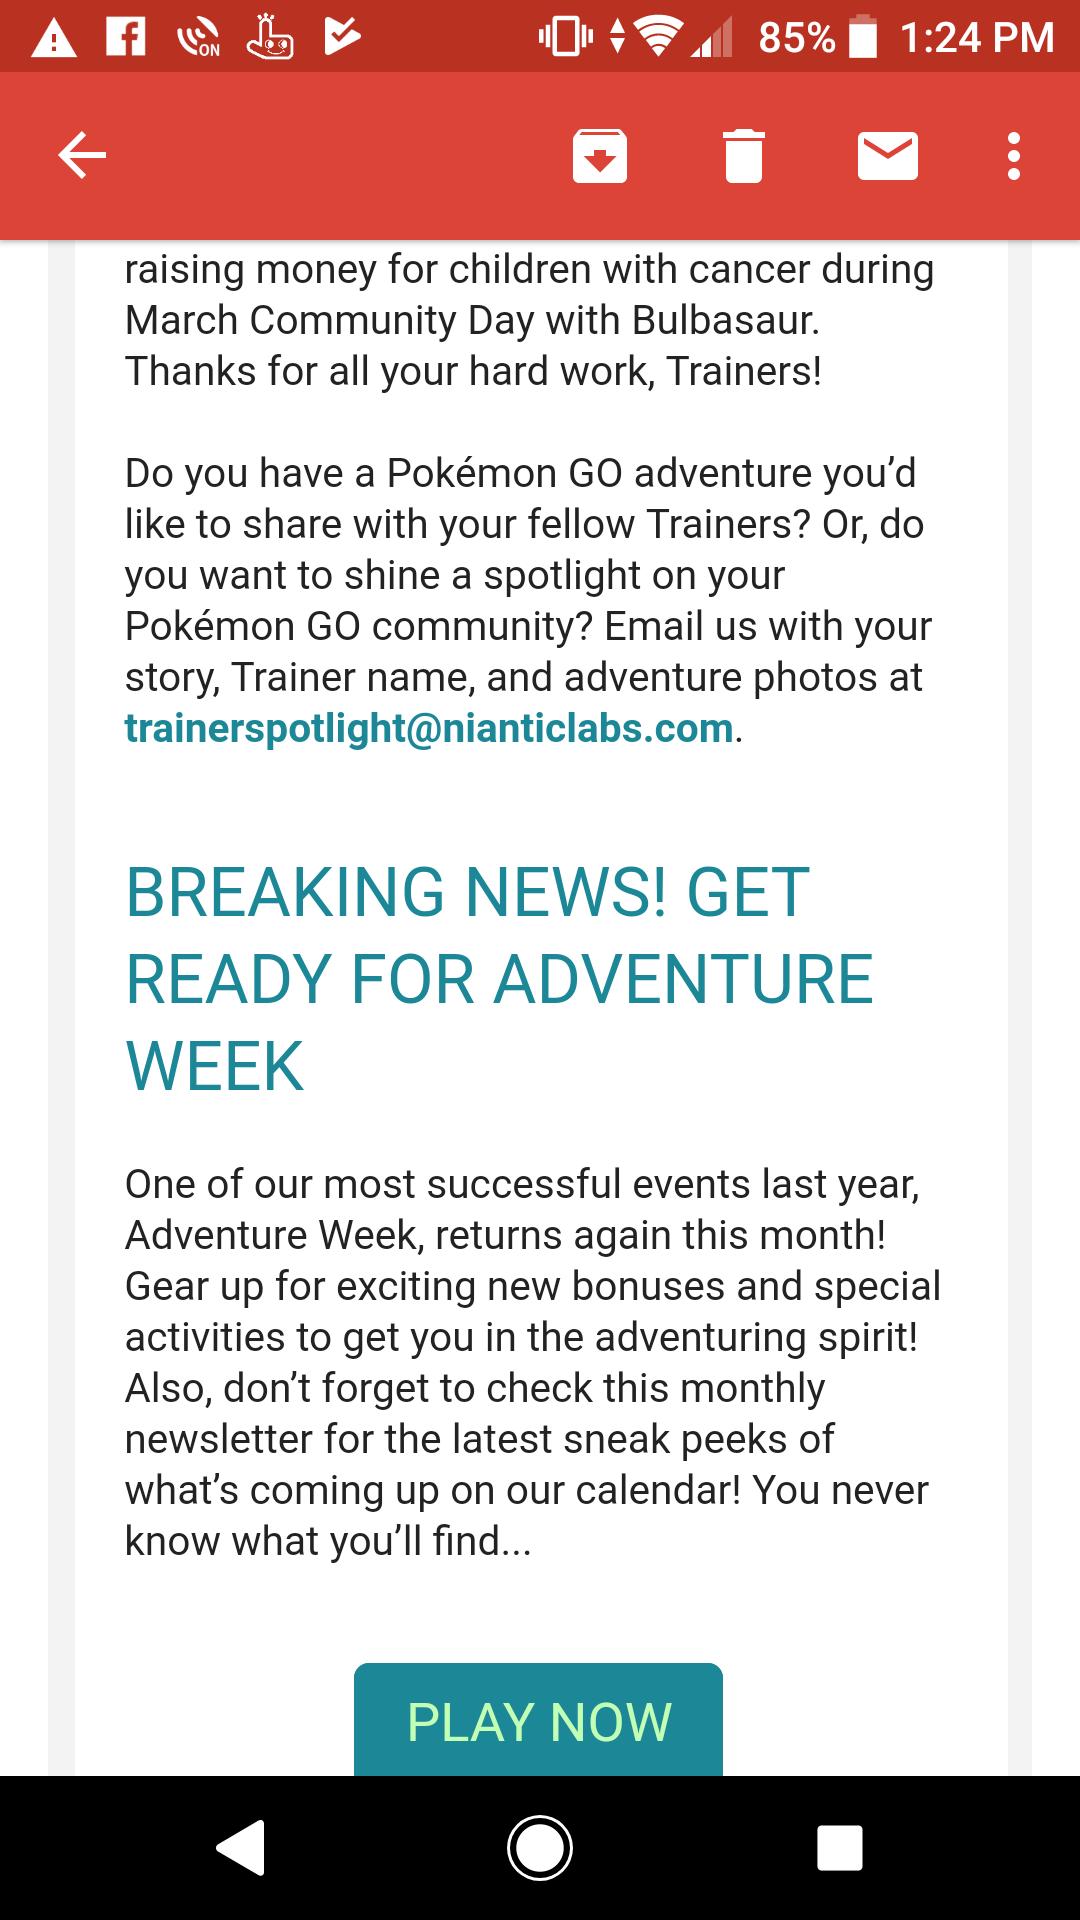 When Adventure Week 2018 (Rock event) is Starting